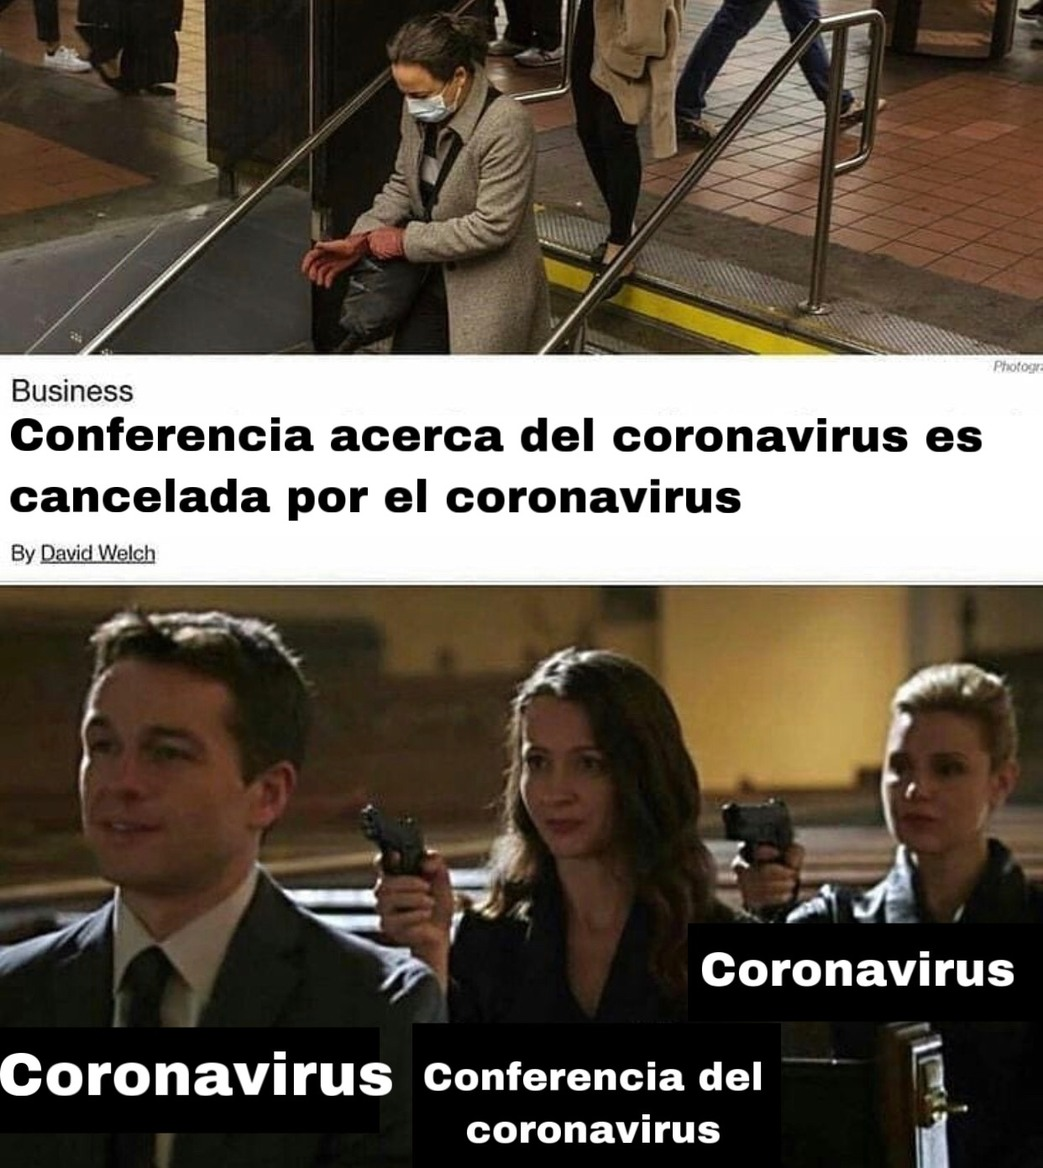 Covid19  ➞SIGUENOS:  @ImgsWhatsapp  ➞Etiqueta A Tus Amigos • • • #memes #momazos #bromaspesadas #momos #gracioso #chistes_hp #chistetipico #vrutal #memesespañoles #humoramarillo #humorespañol #memesenespañol #memesmundial #bromas #carcajada #memesespañol #humorpic.twitter.com/IeVvbewJkk